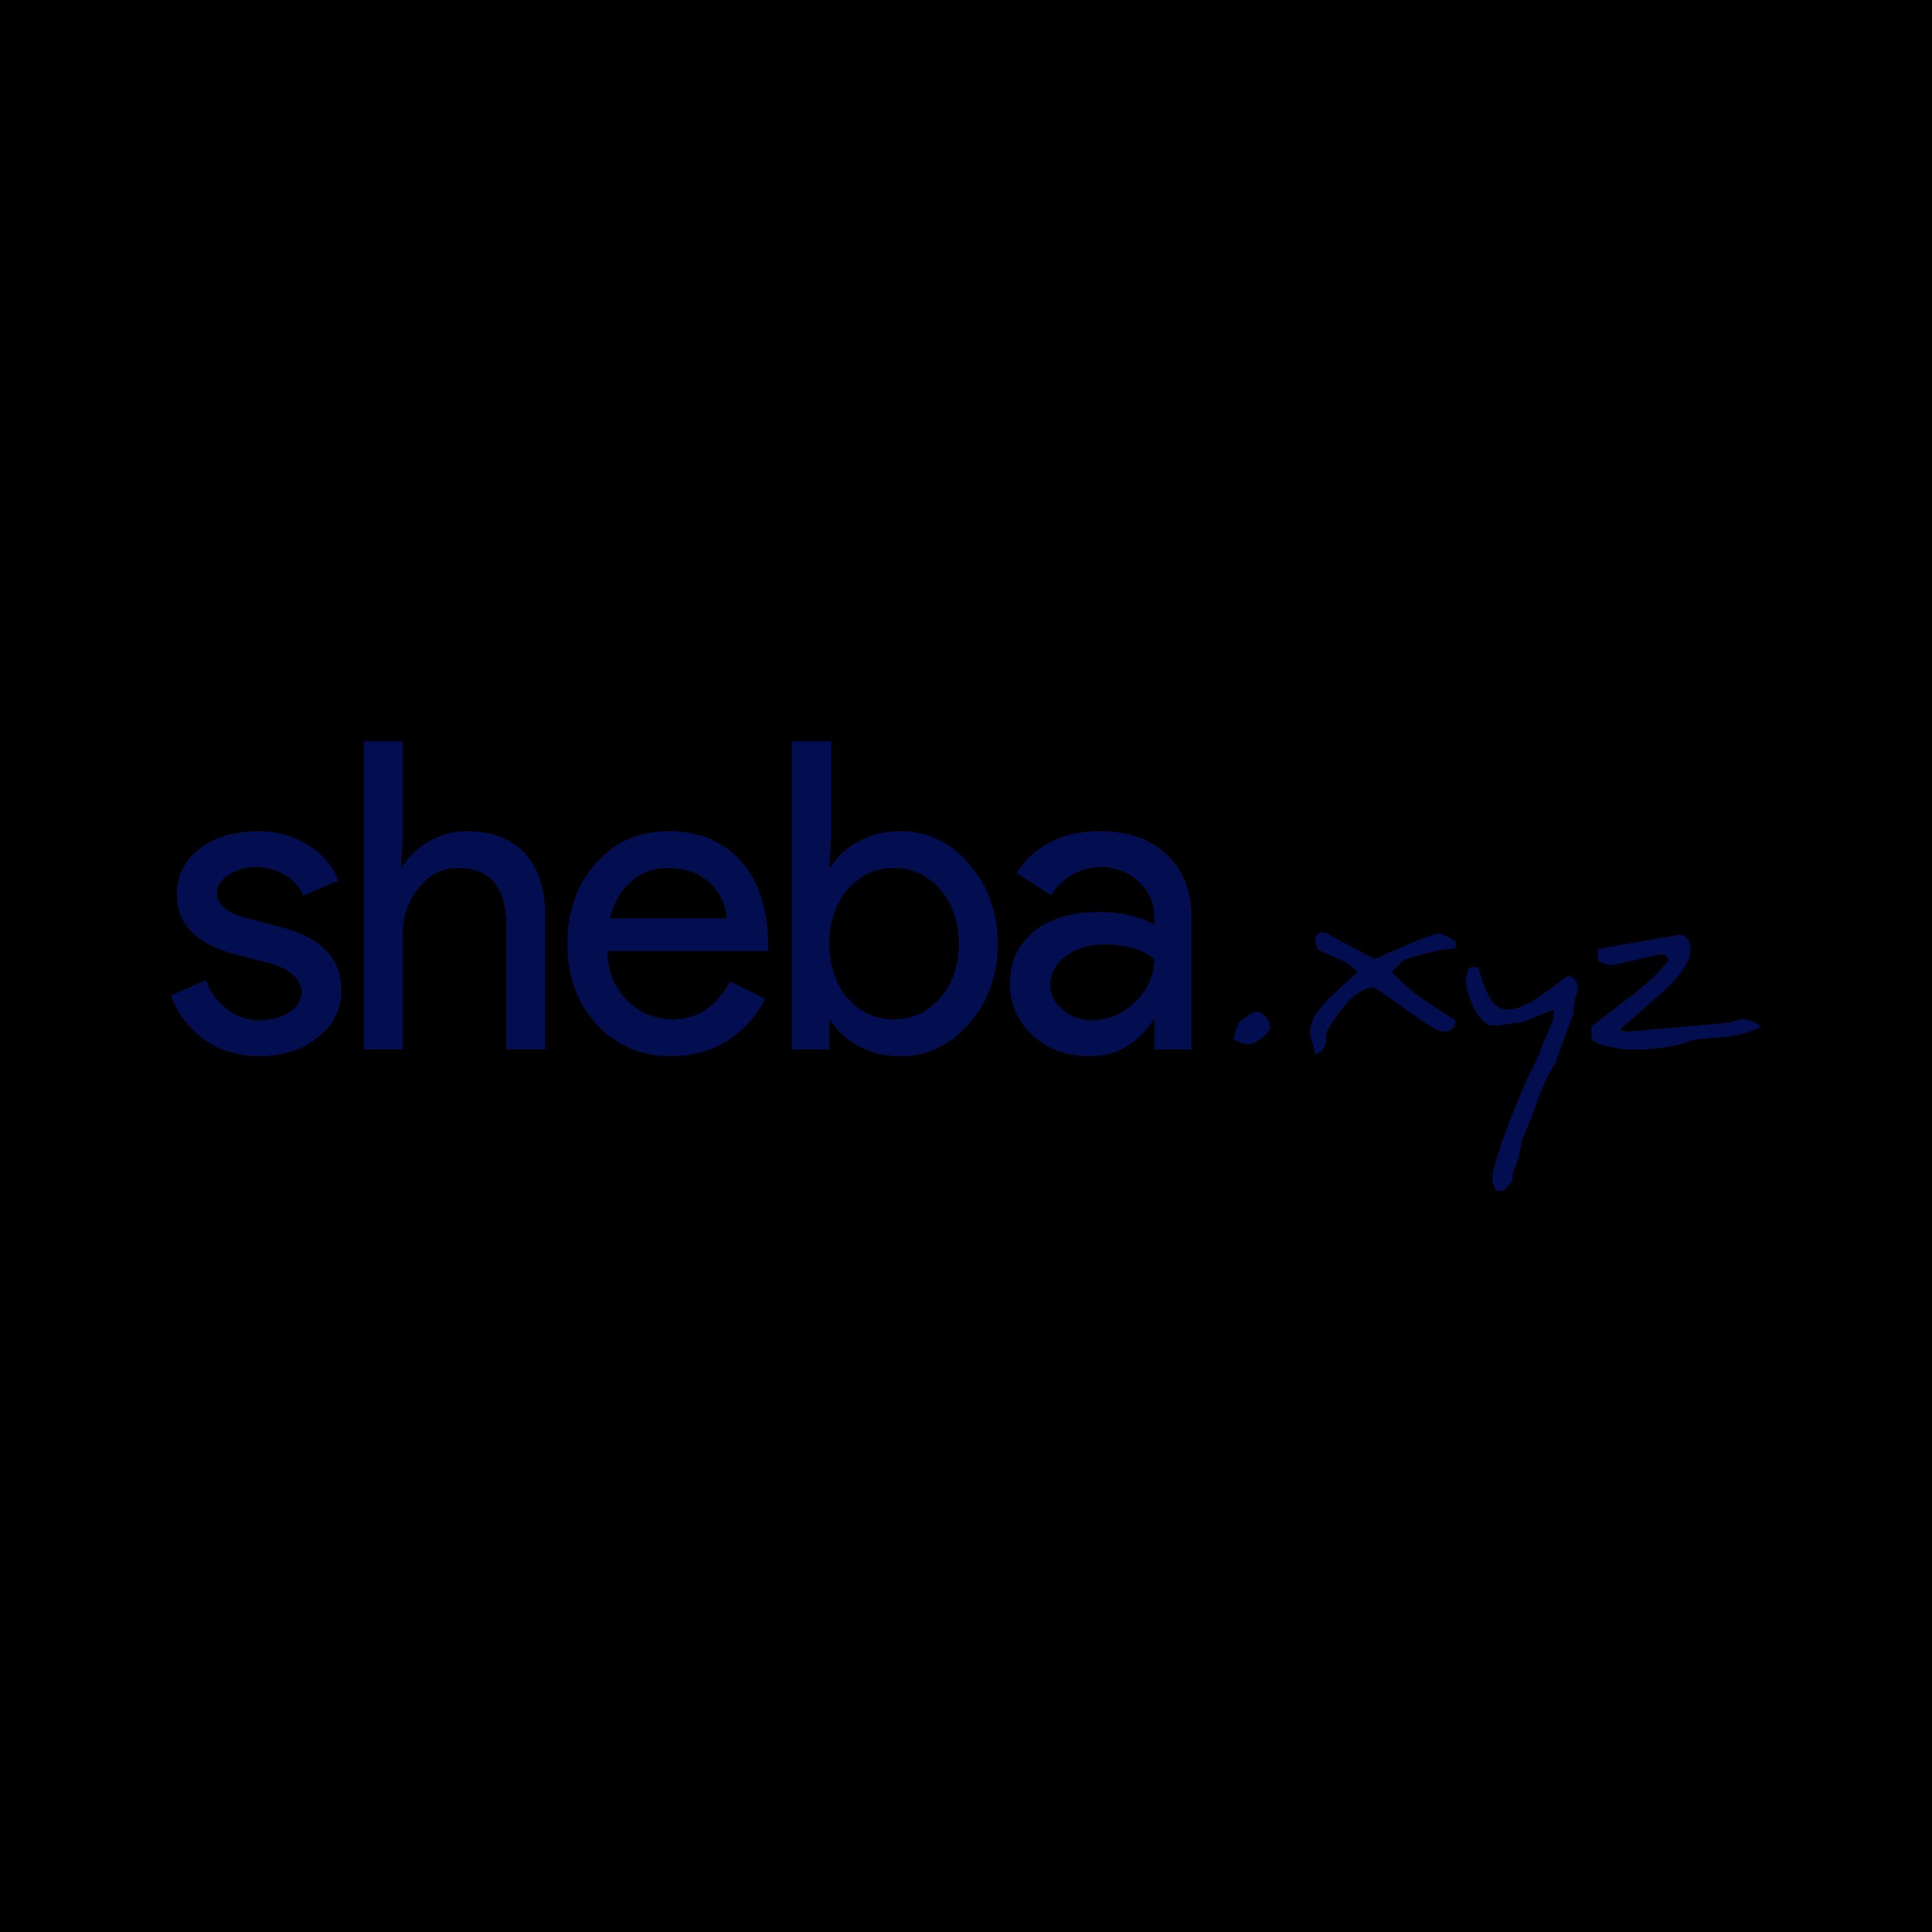 https://assets.roar.media/assets/WM1bRZaZxyTfD7yC_Sheba-Logo.png